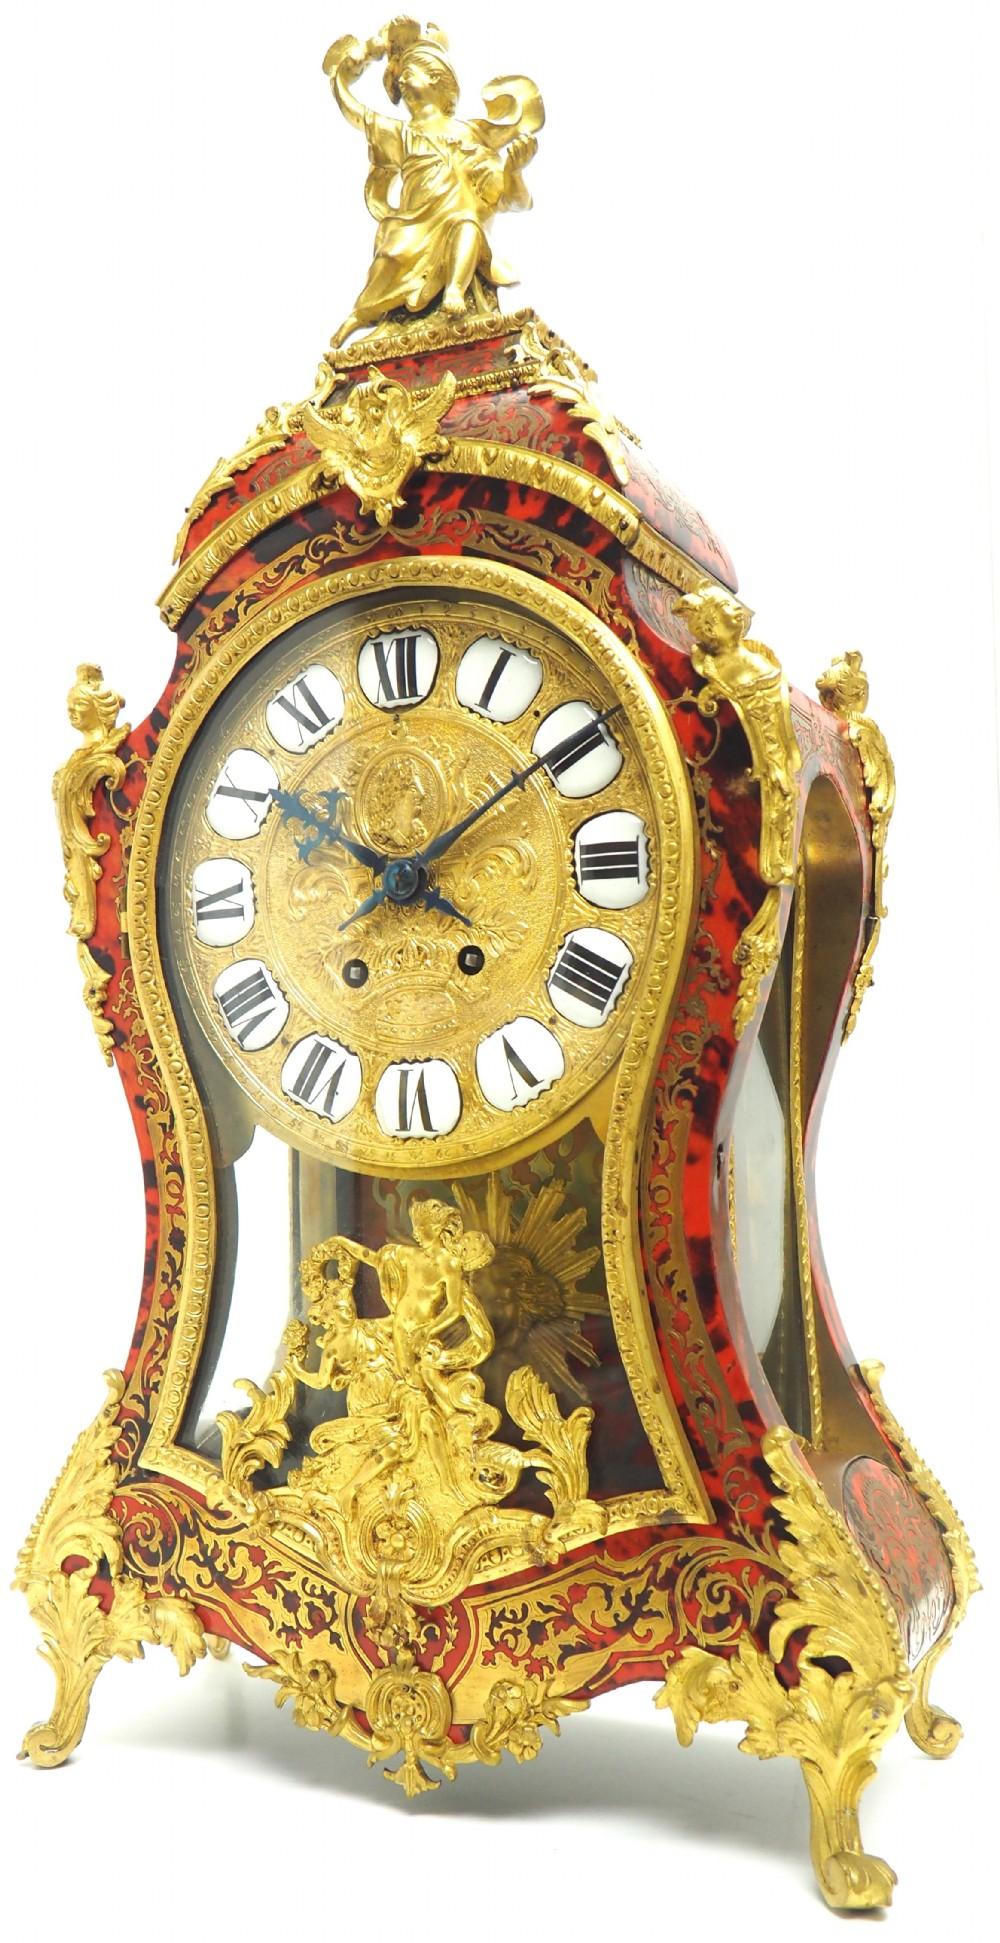 wow phenomenal french boulle mantel clock rare 8day striking bracket clock superb condition